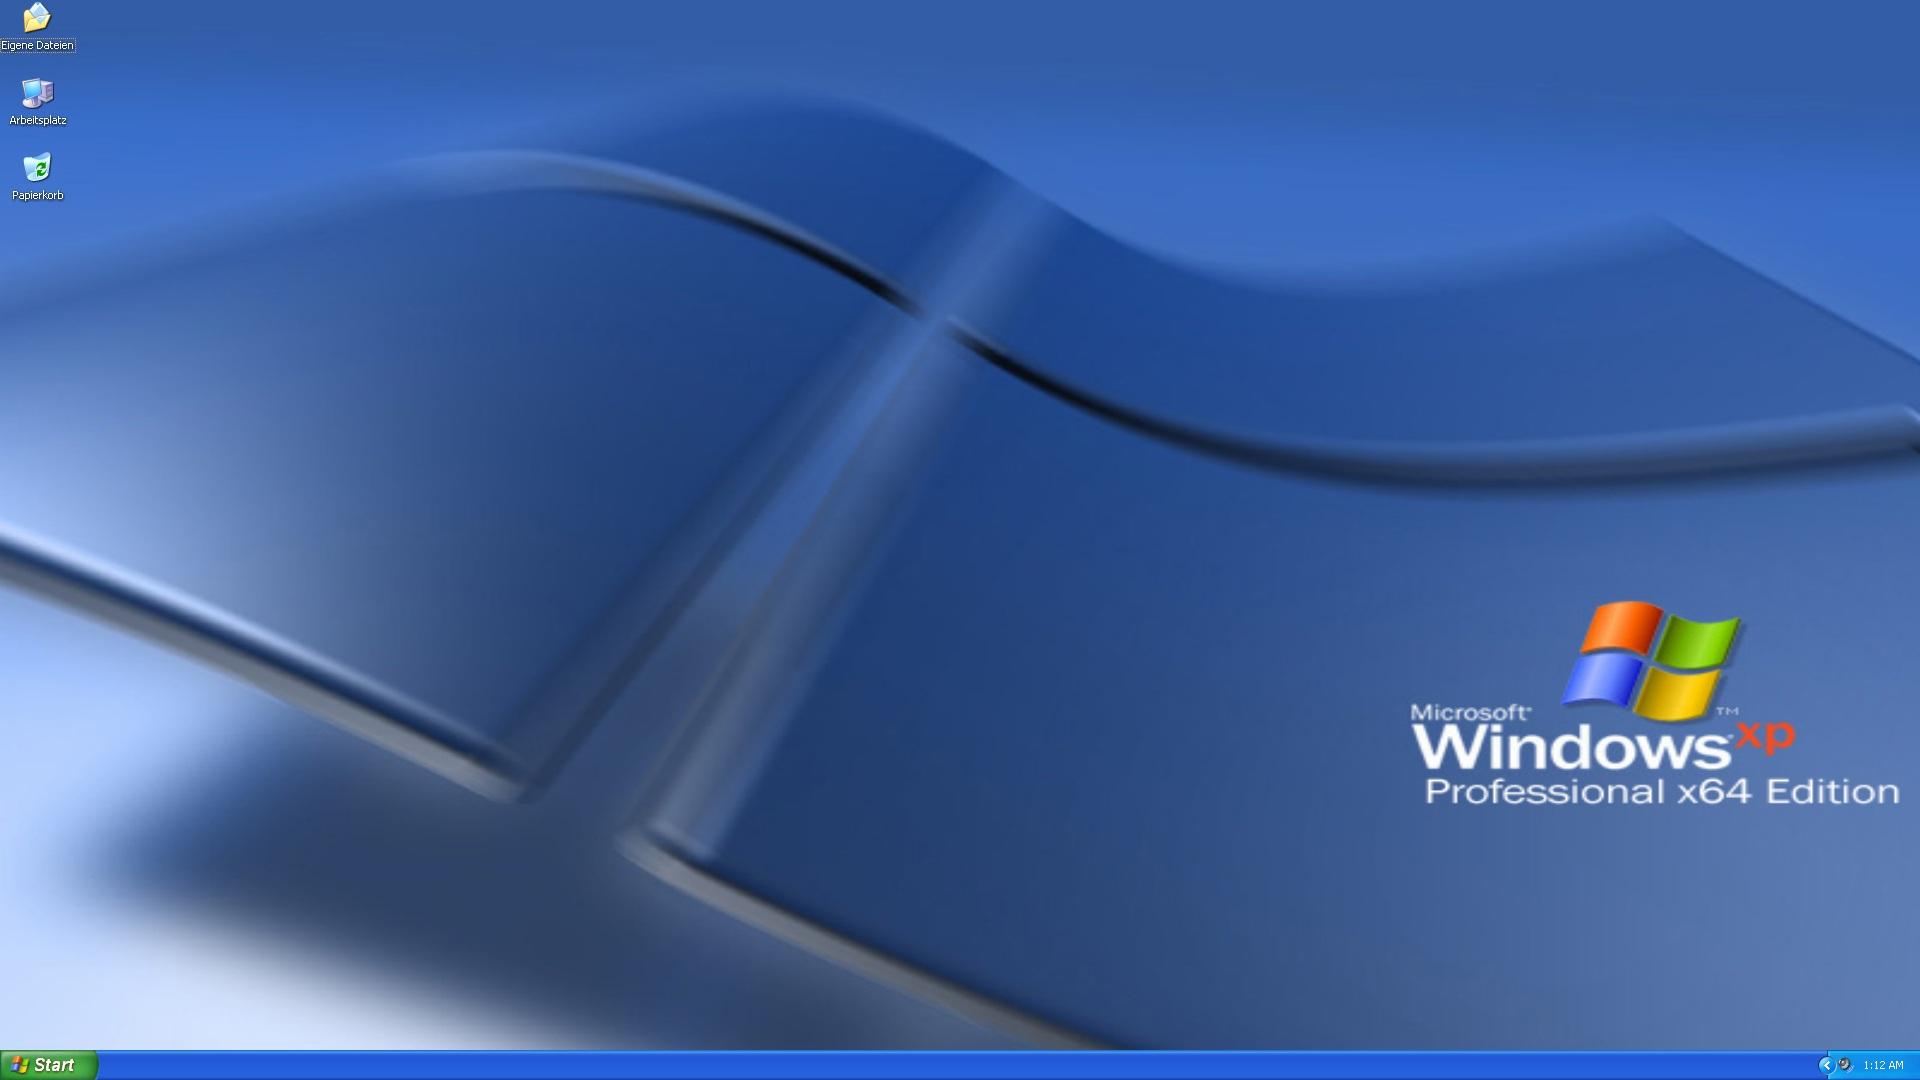 Windows xp professional x64 wallpaper 268615 for Window xp wallpaper